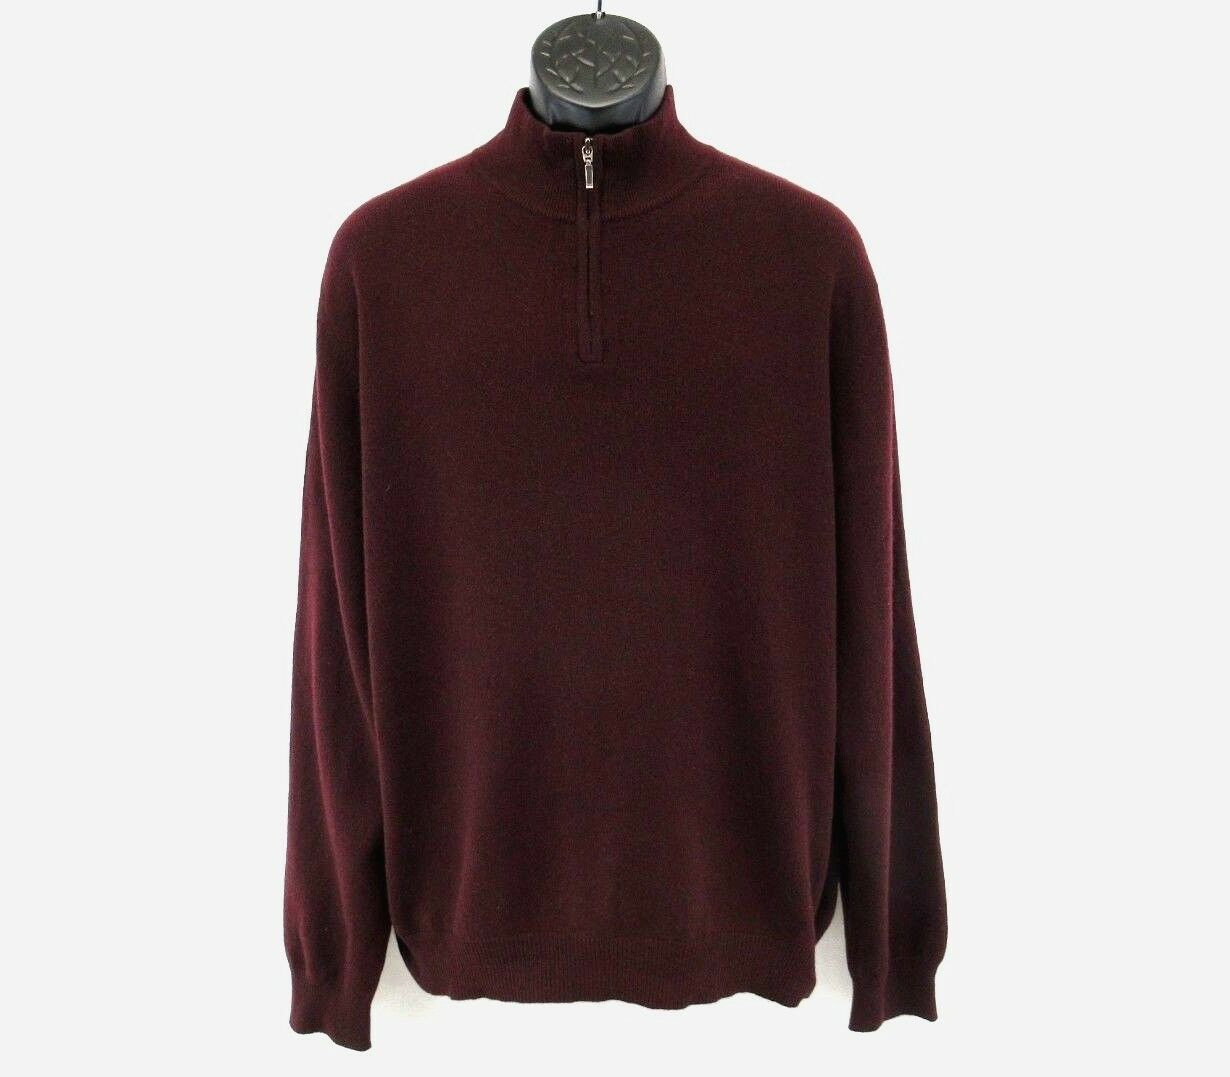 Joseph & Lyman 100% Cashmere Half Zip Maroon Sweater Men's Size XL  C440